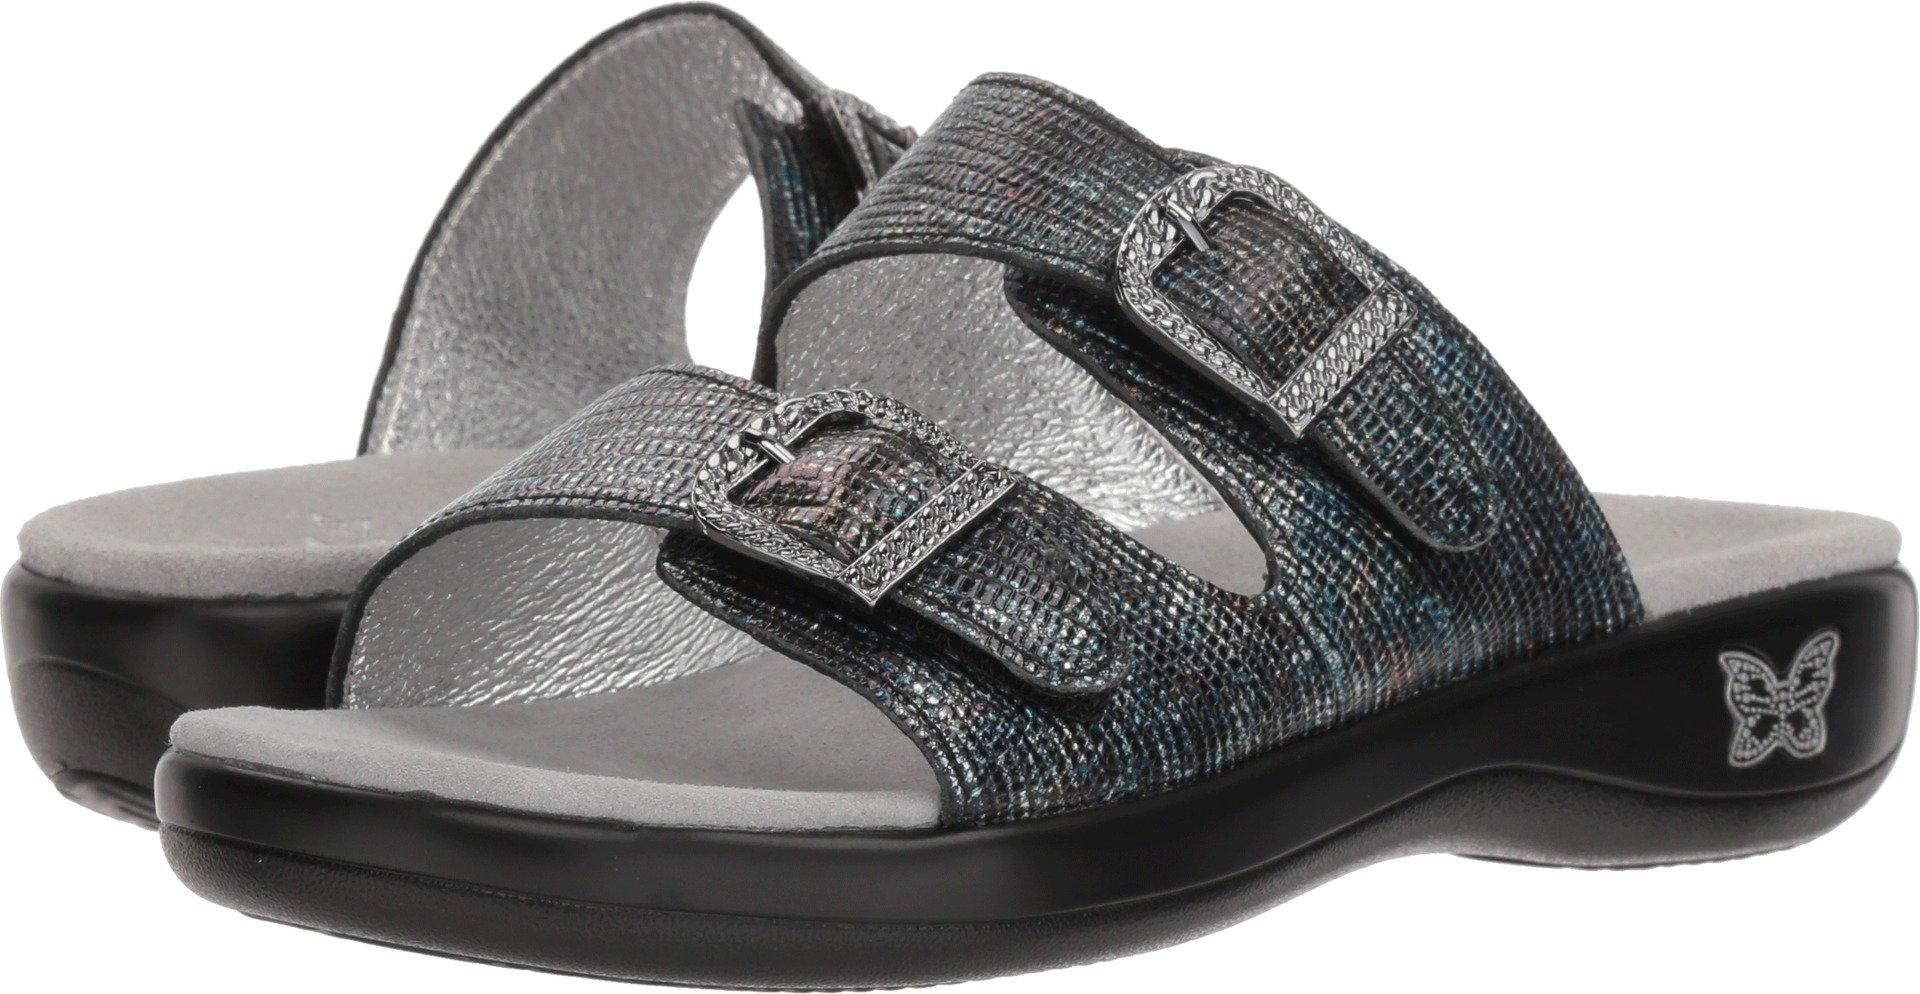 Alegria Womens Jade Sandal, Glimmer Glam, Size 41 EU (10.5-11 M US Women)